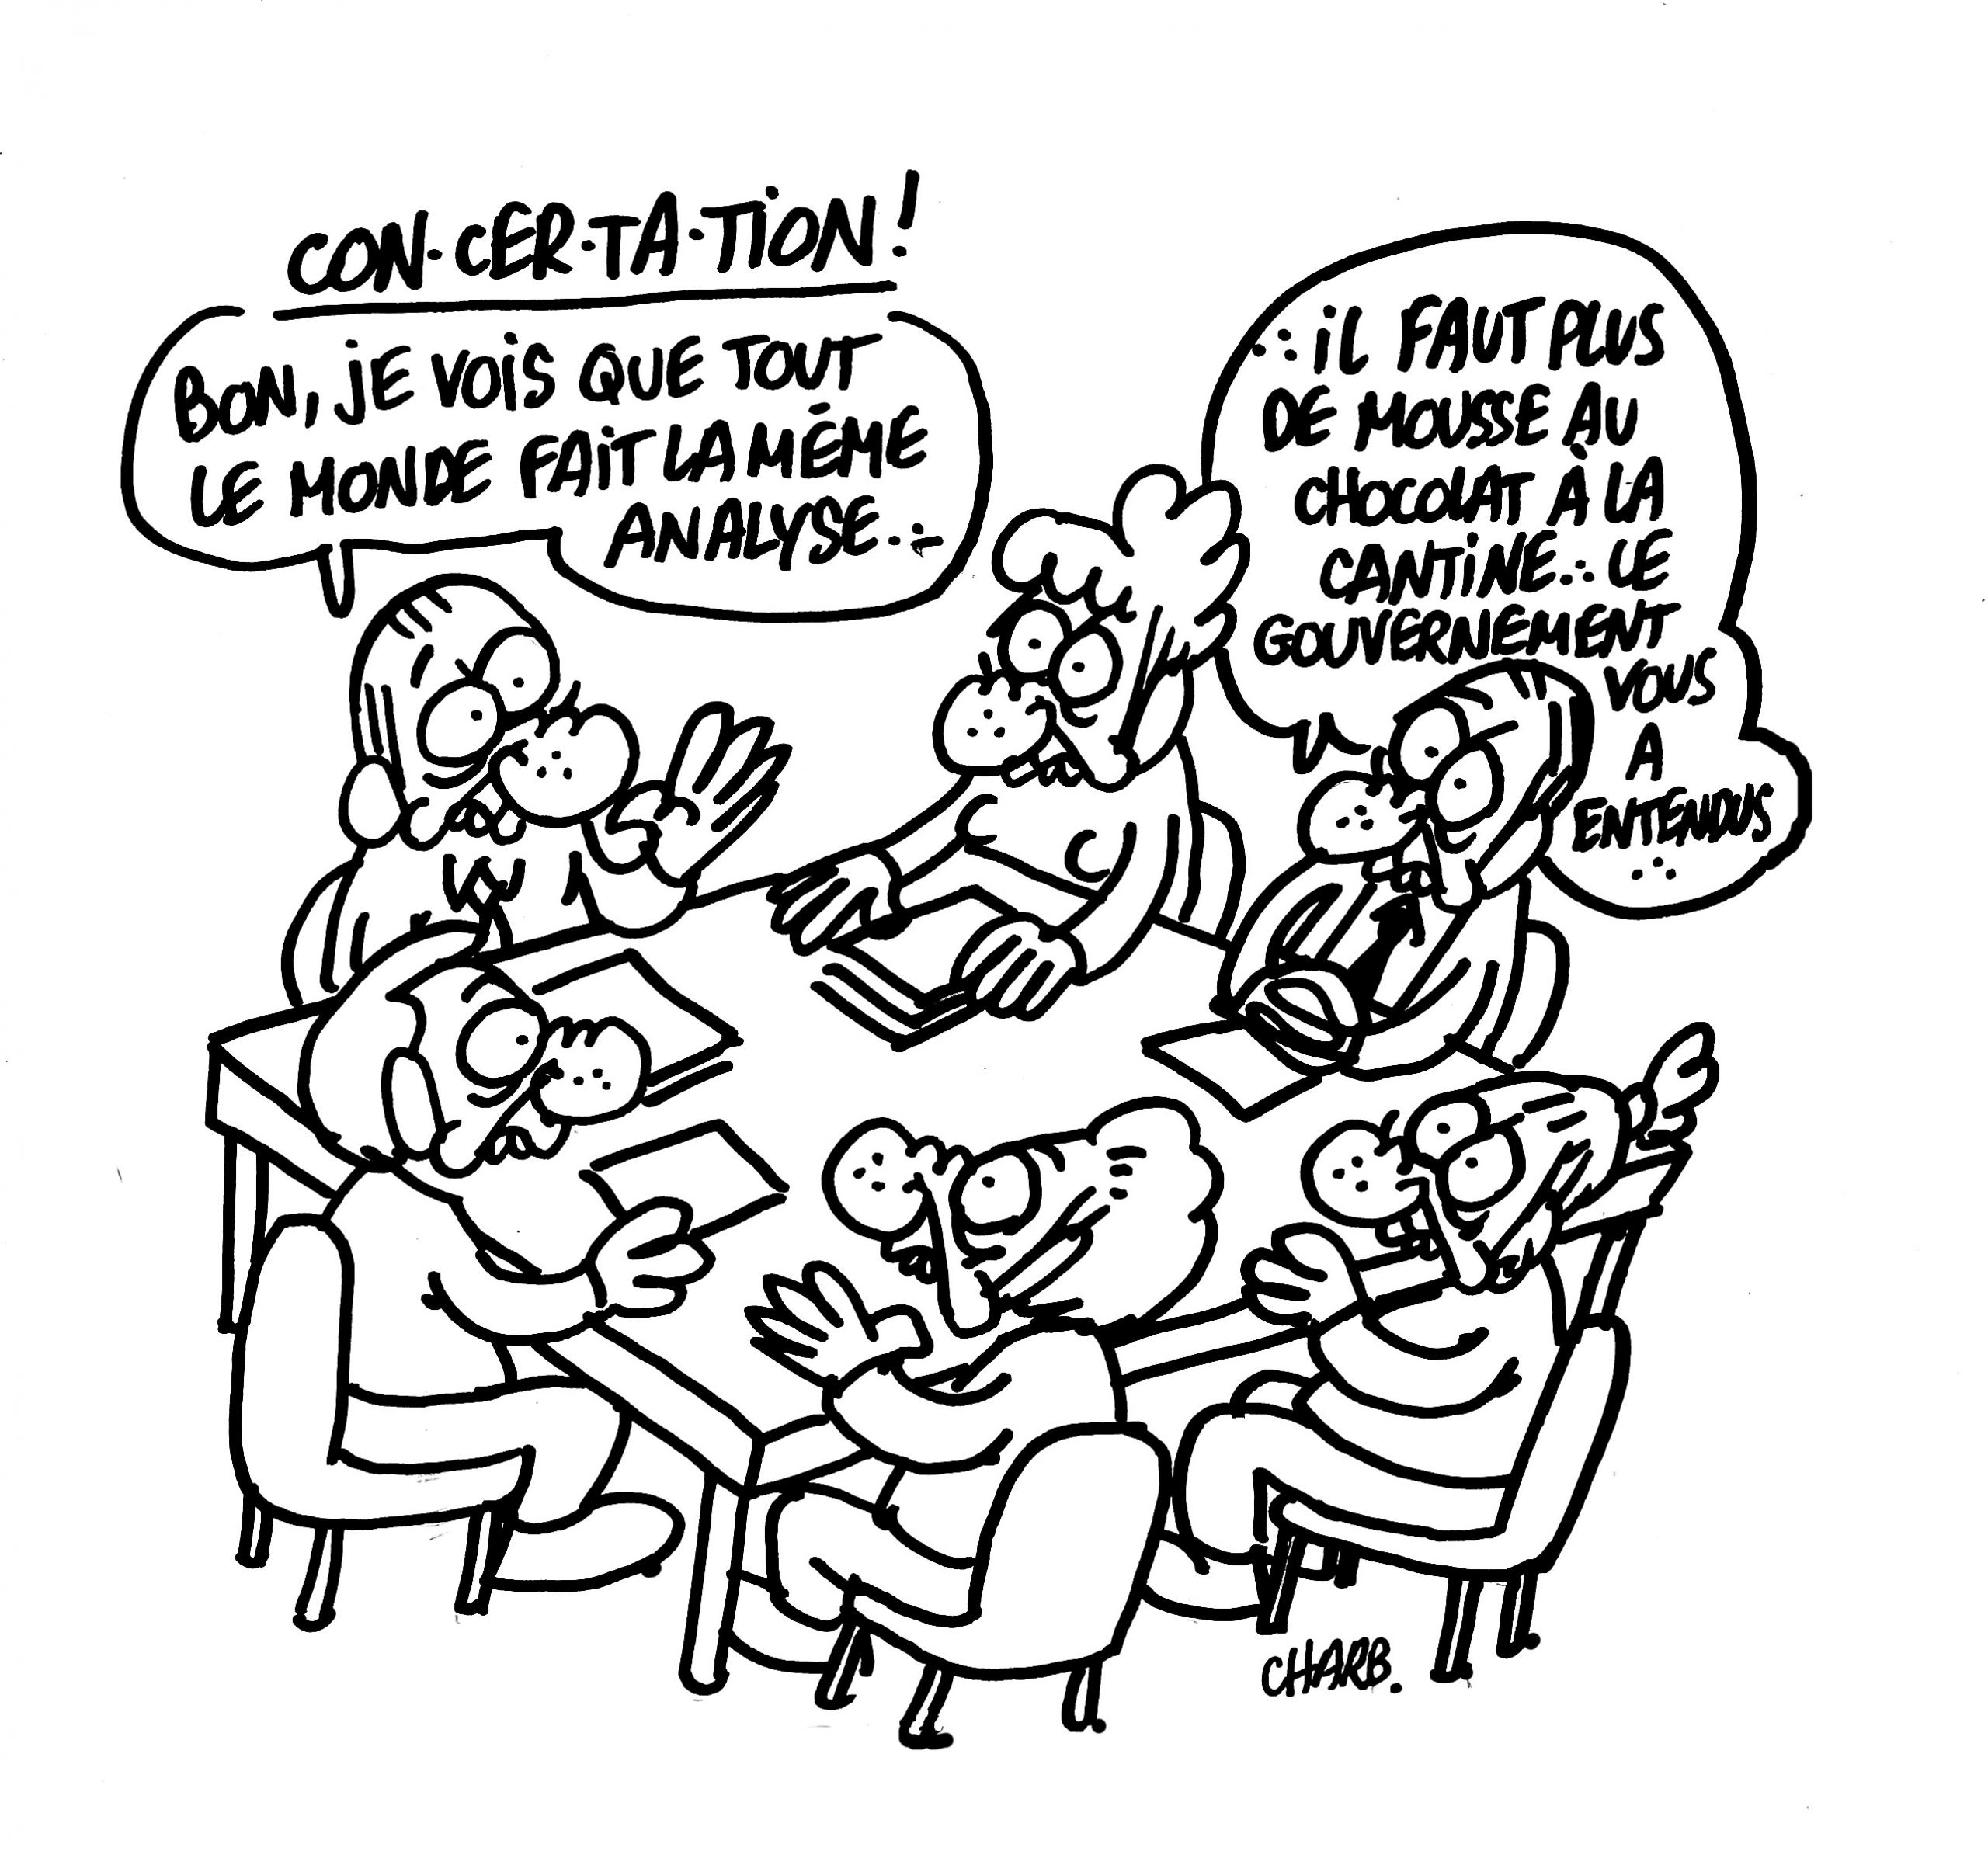 mousse_au_chocolat.jpg